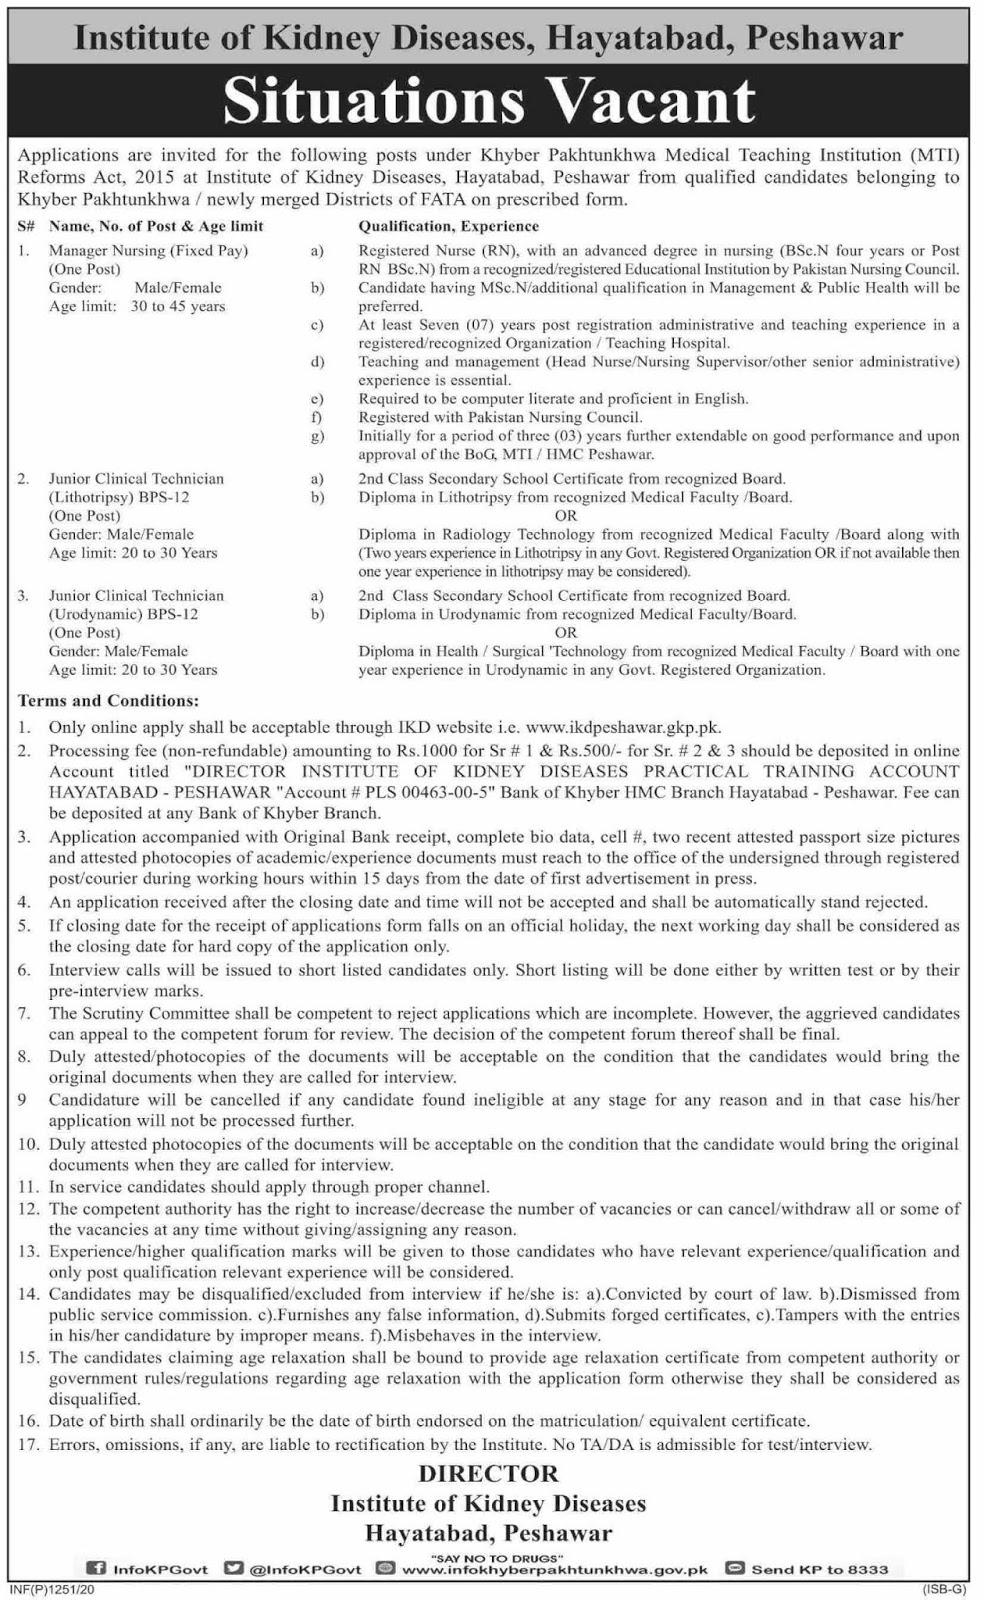 Jobs in Institute of Kidney Diseases Hayatabad, Peshawar 2020